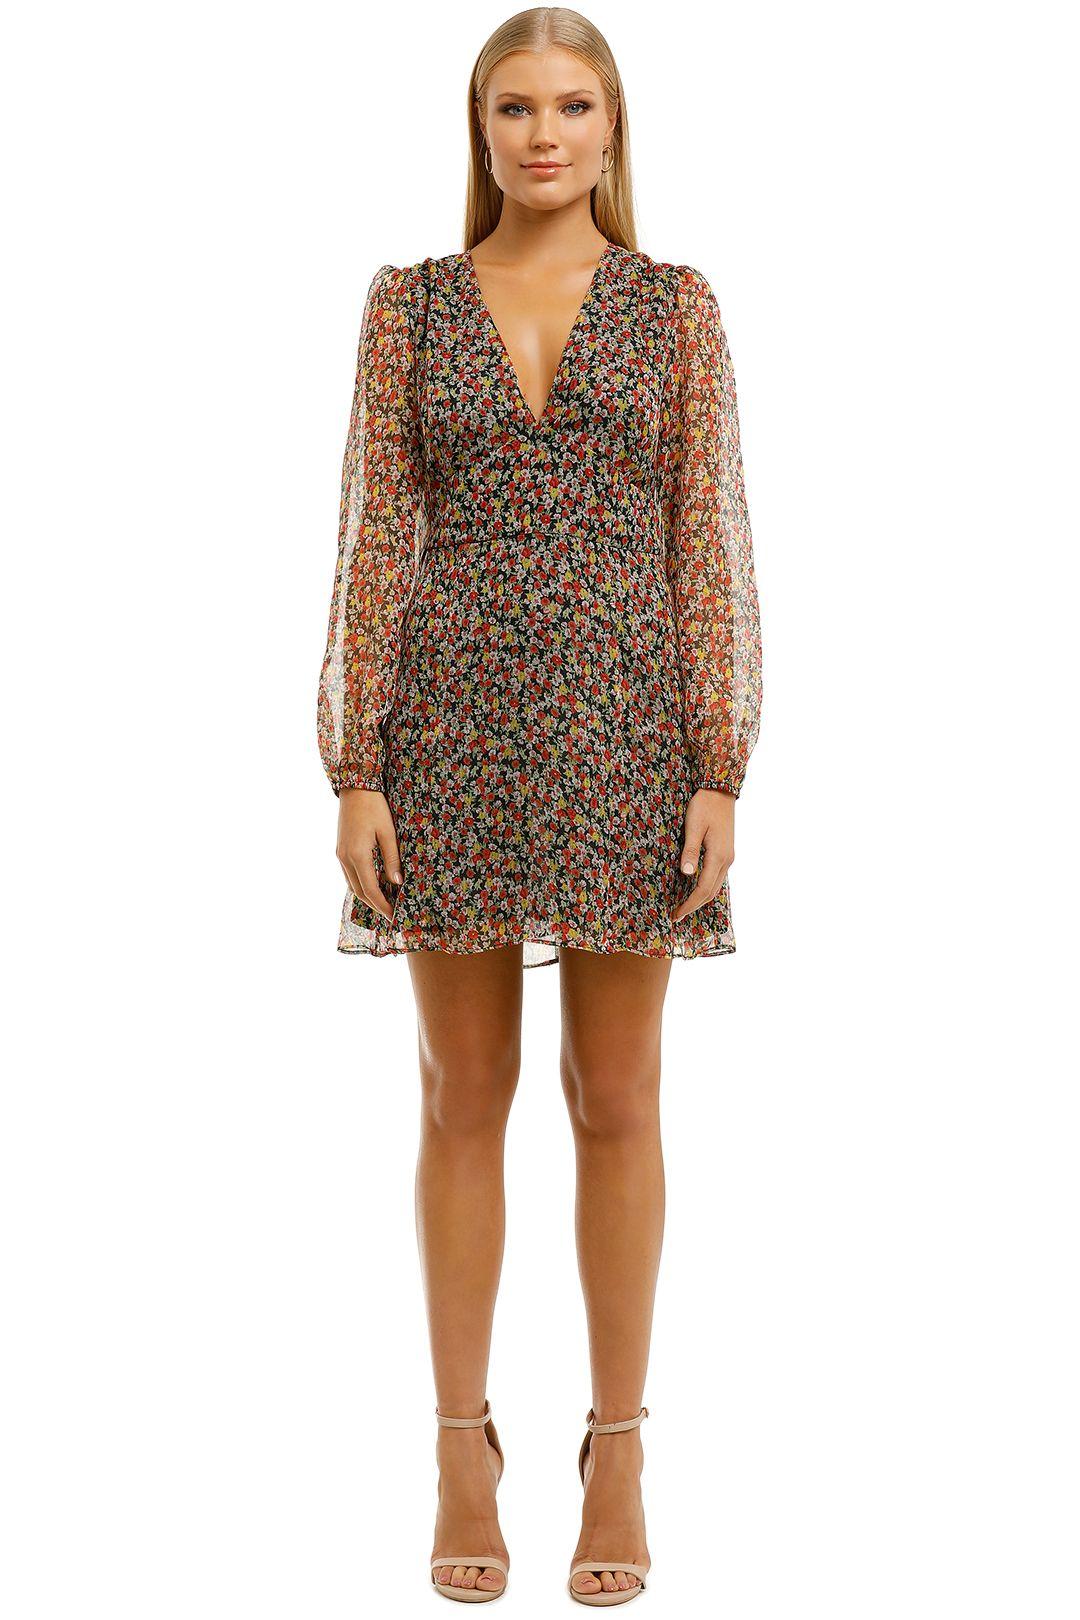 The-East-Order-Brooklyn-LS-Mini-Dress-Sunrise-Bouquet-Front